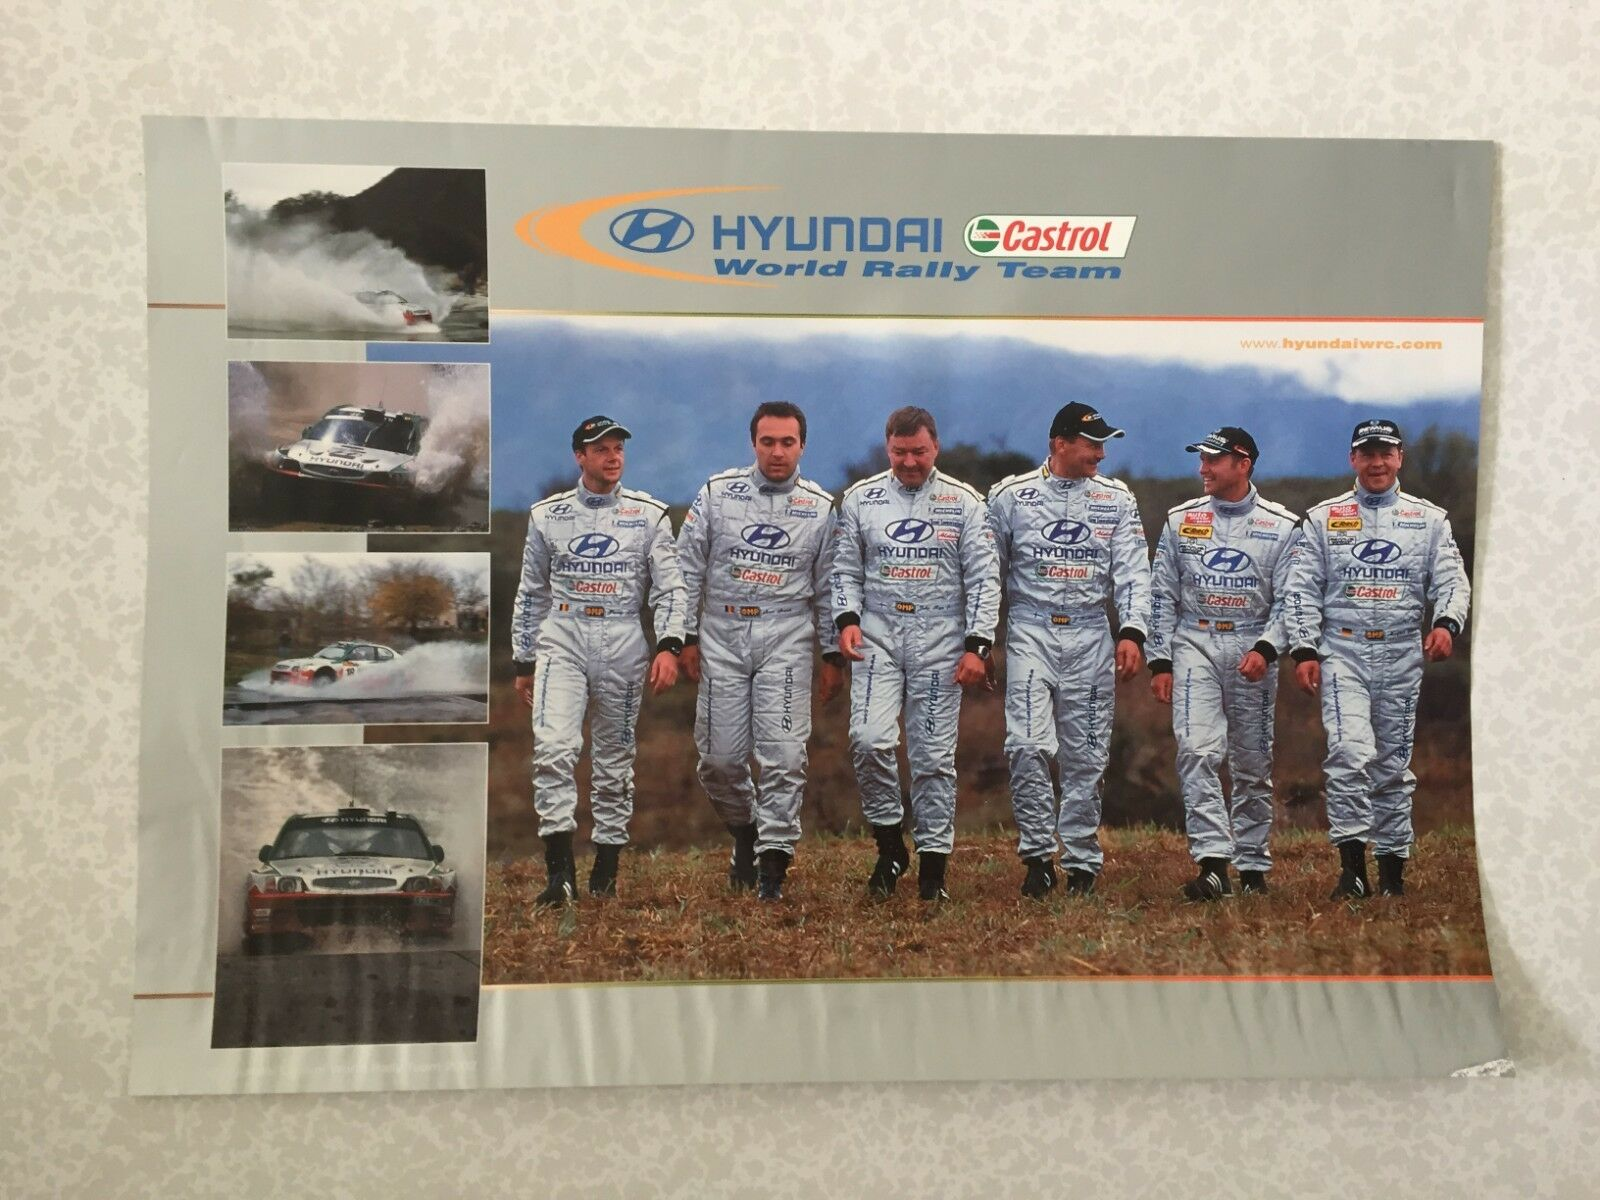 POSTER HYUNDAI CASTROL WORLD 2002 RALLY TEAM 2002 WORLD WRC RALLYE fa0ce8